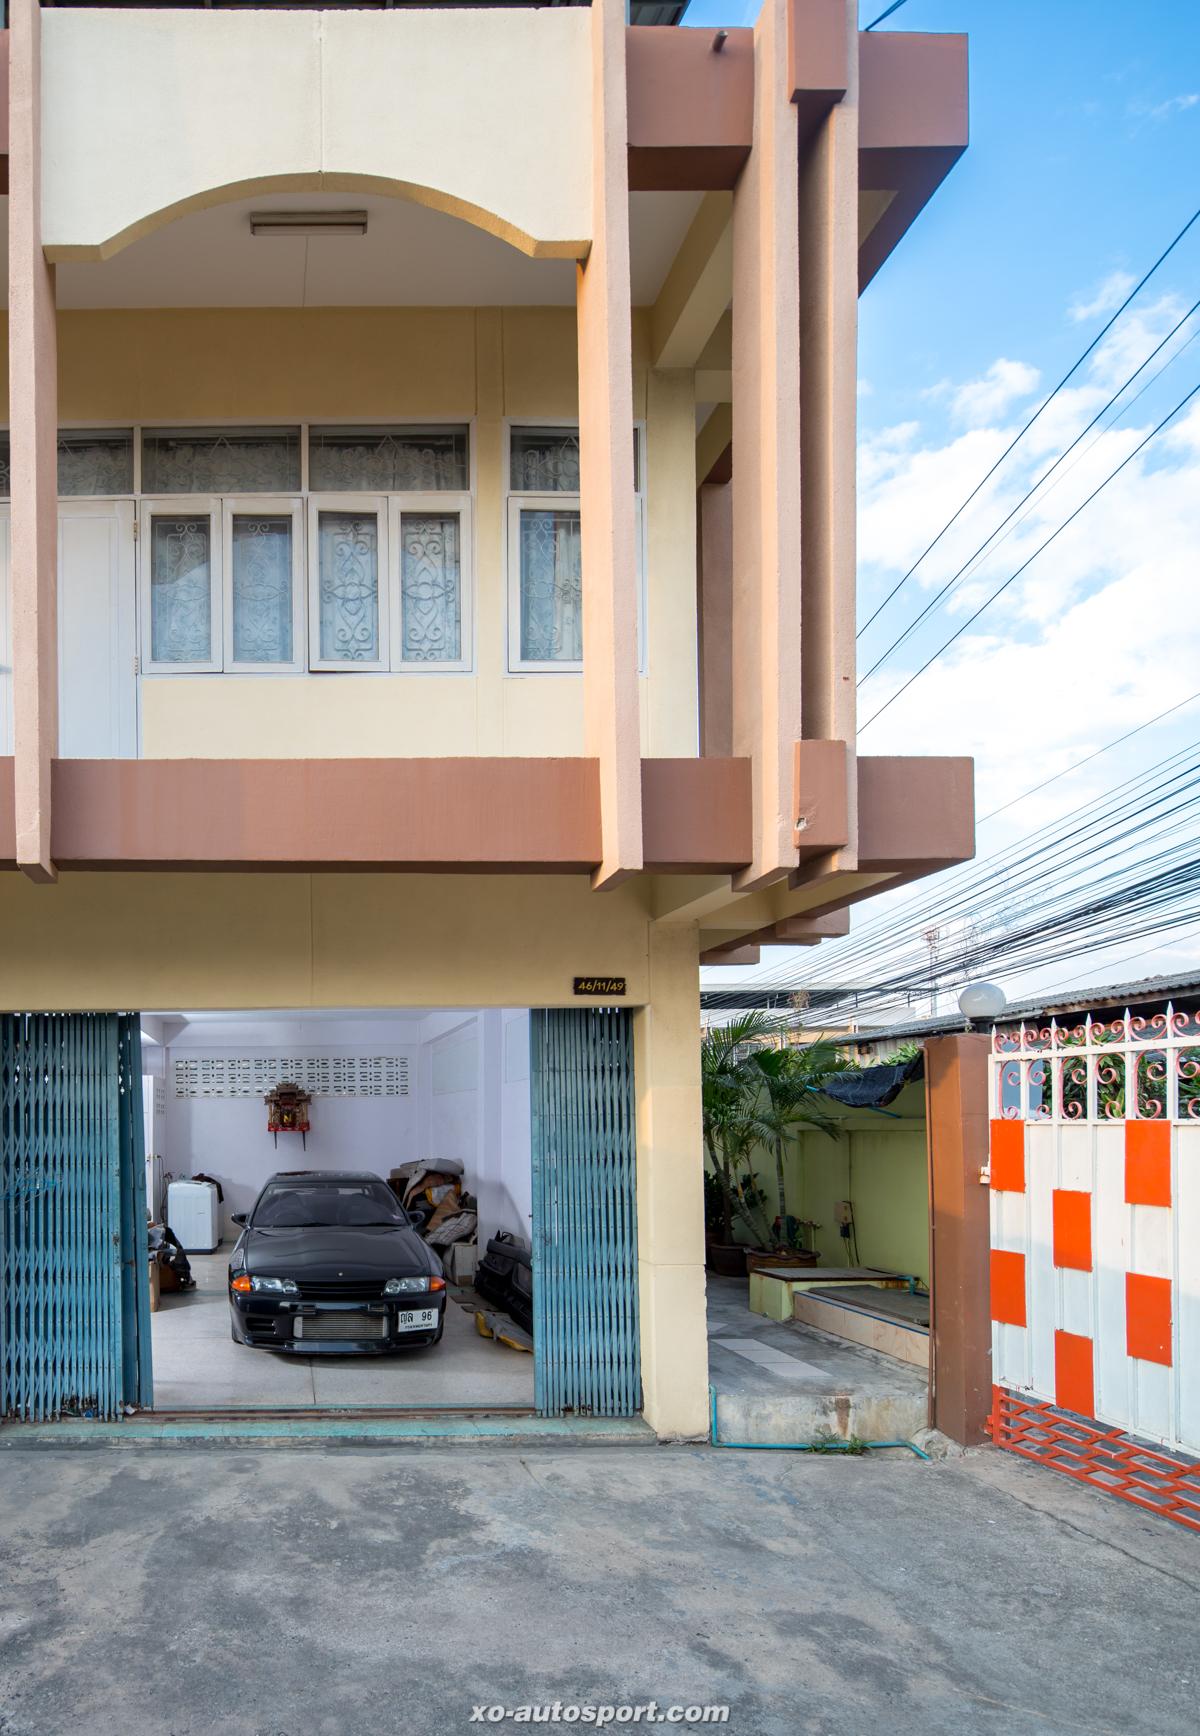 Garage Life_2HH8455